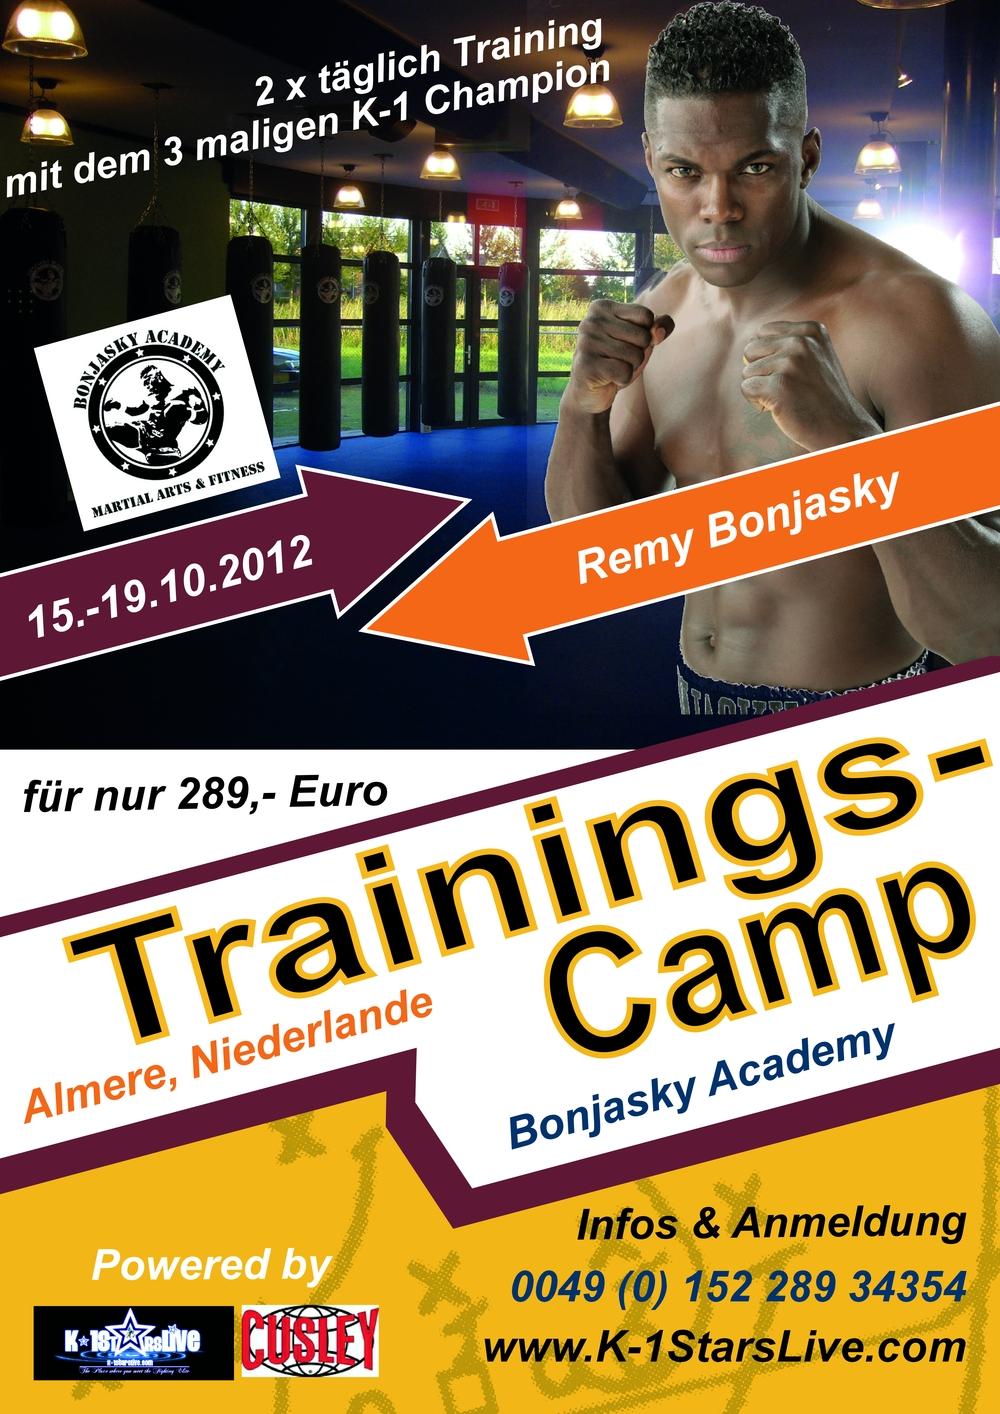 15.10.-19.10.2012 Remy Bonjasky Trainingscamp in Almere